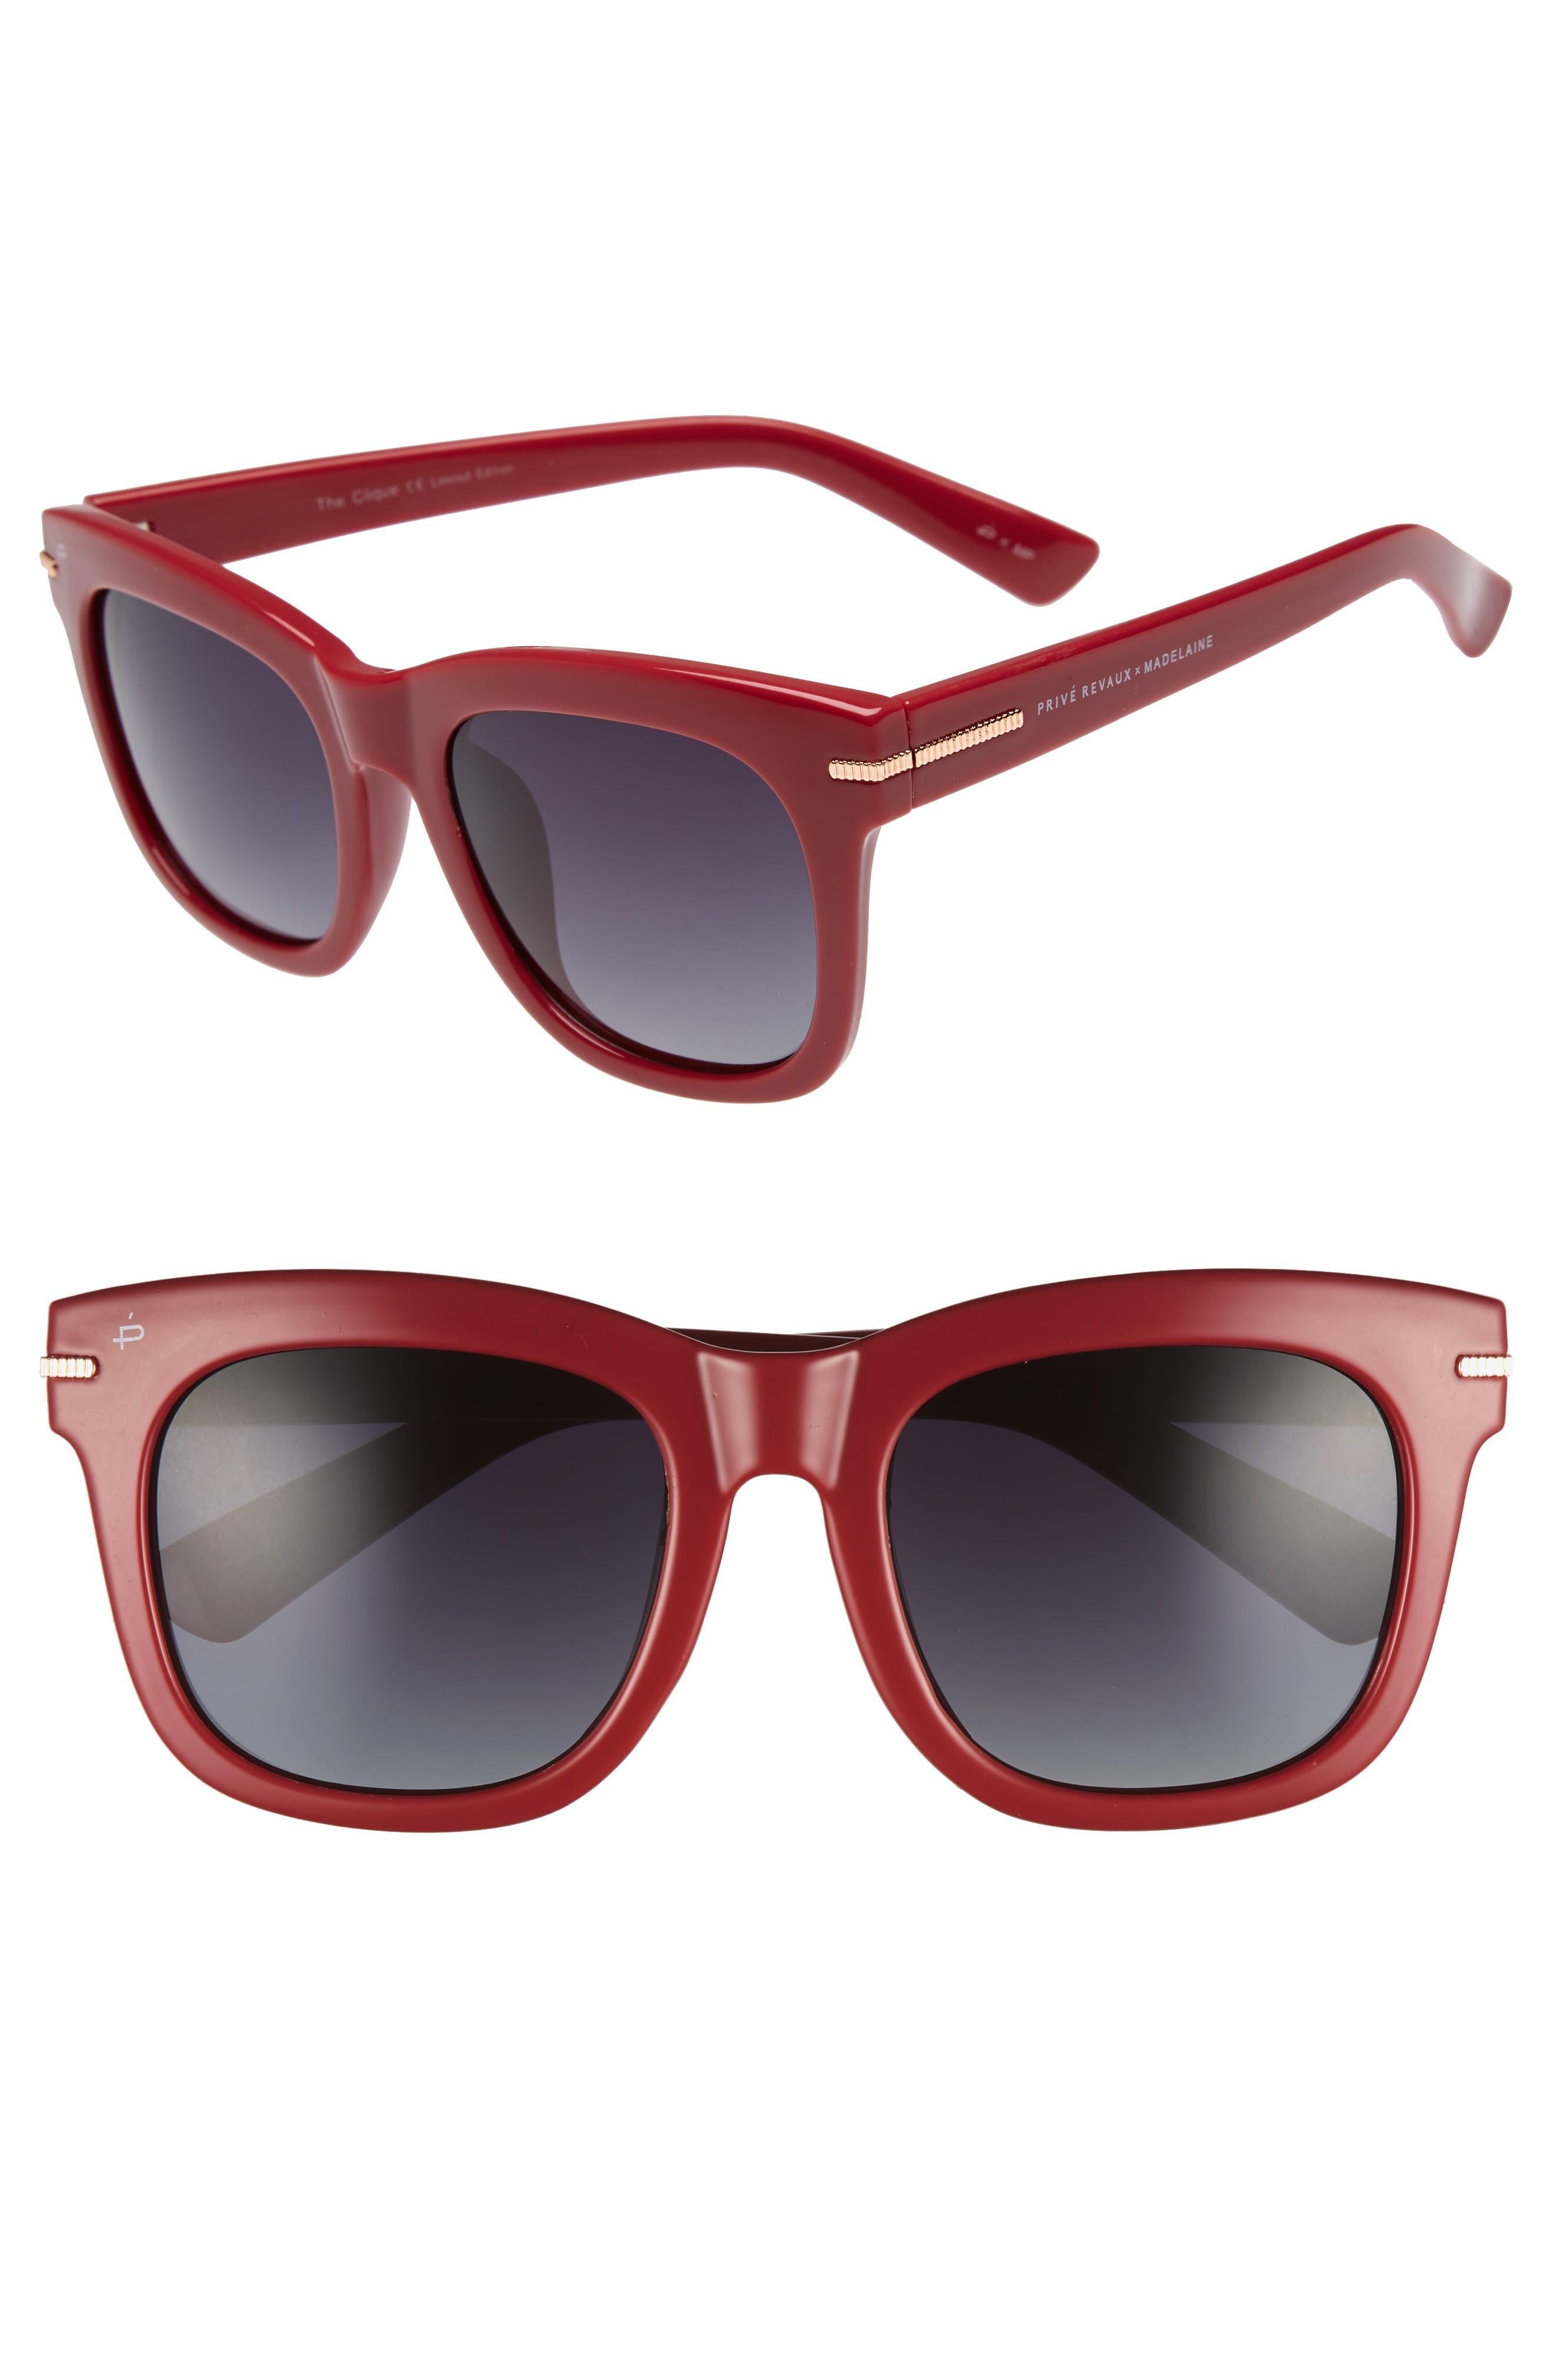 Privé Revaux x Madelaine Petsch The Clique 52mm Square Sunglasses,                             Main thumbnail 1, color,                             RED